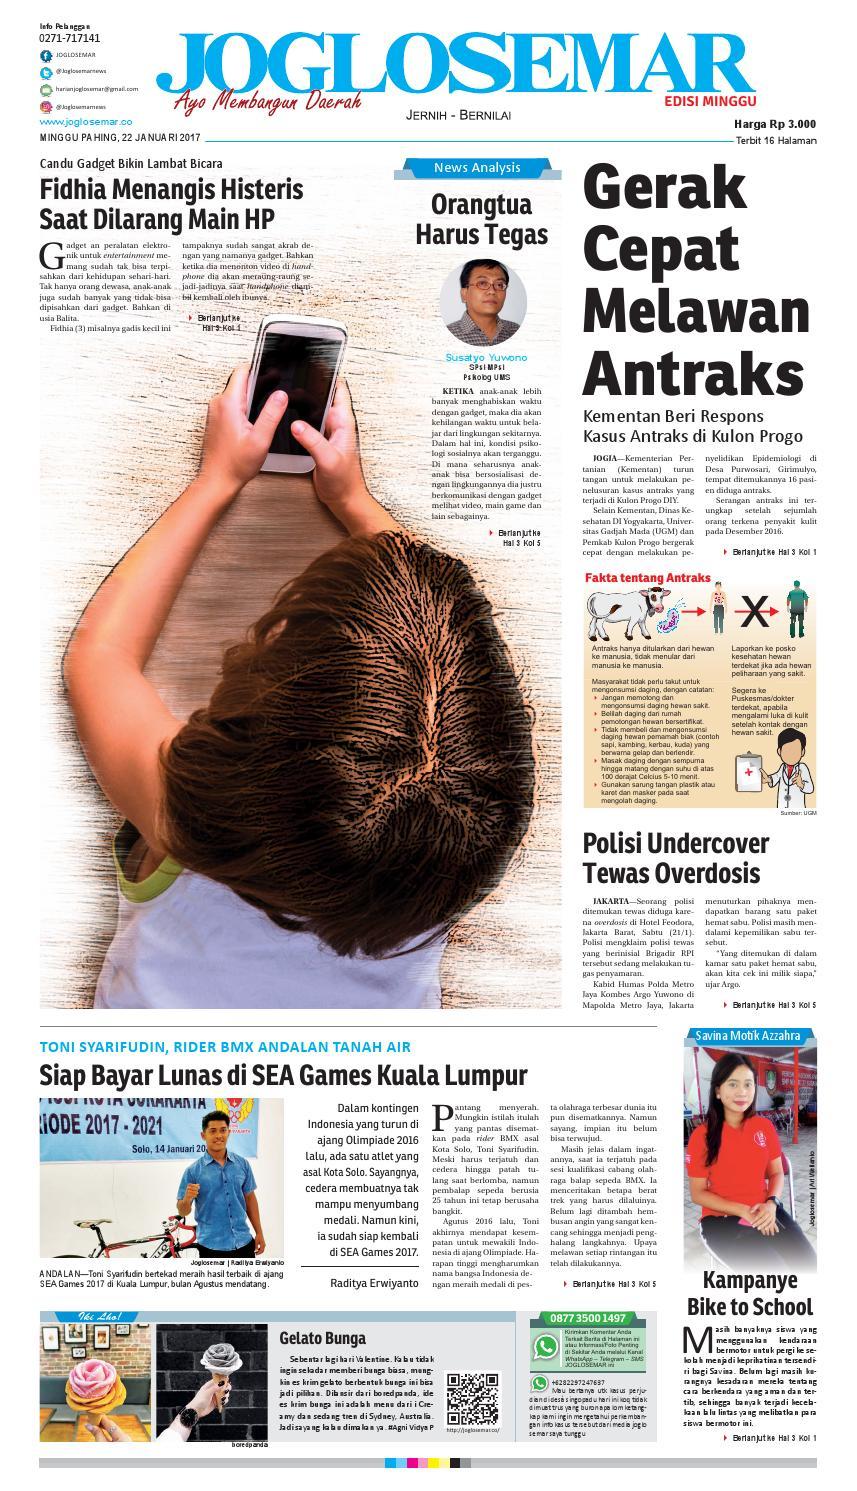 E paper 22 januari 2017 by PT Joglosemar Prima Media - issuu 376718e3eb